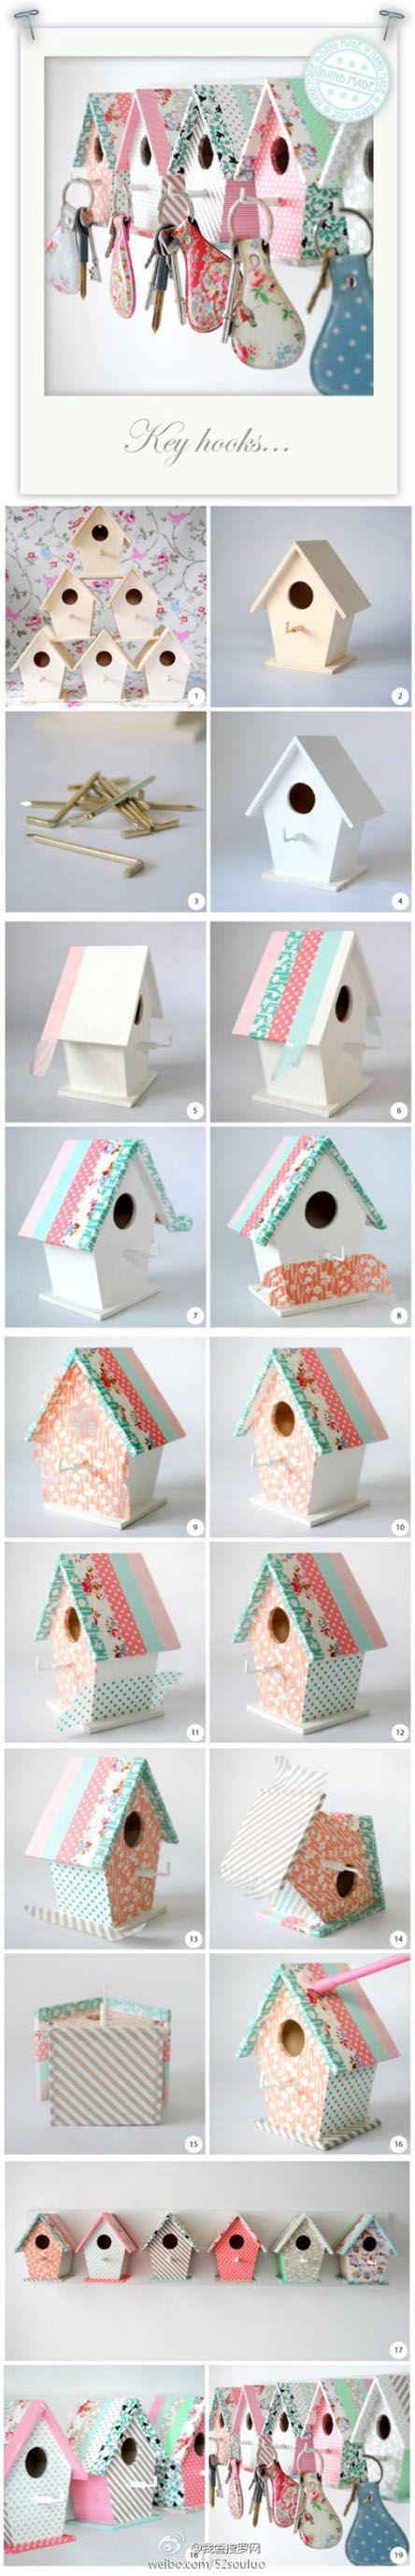 So Cute Craft | DIY & Crafts Tutorials